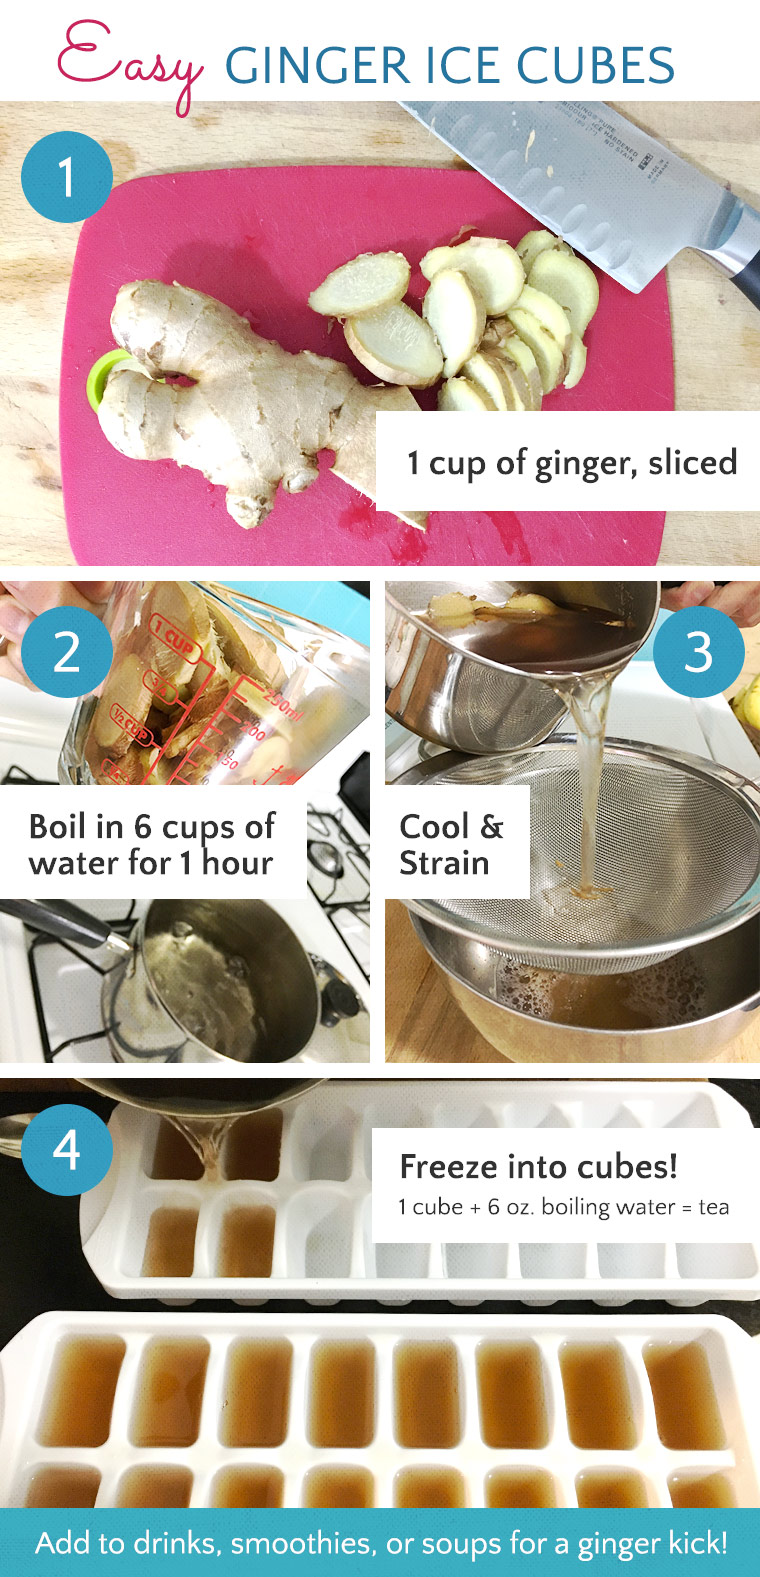 Easy Ginger Ice Cube Recipe